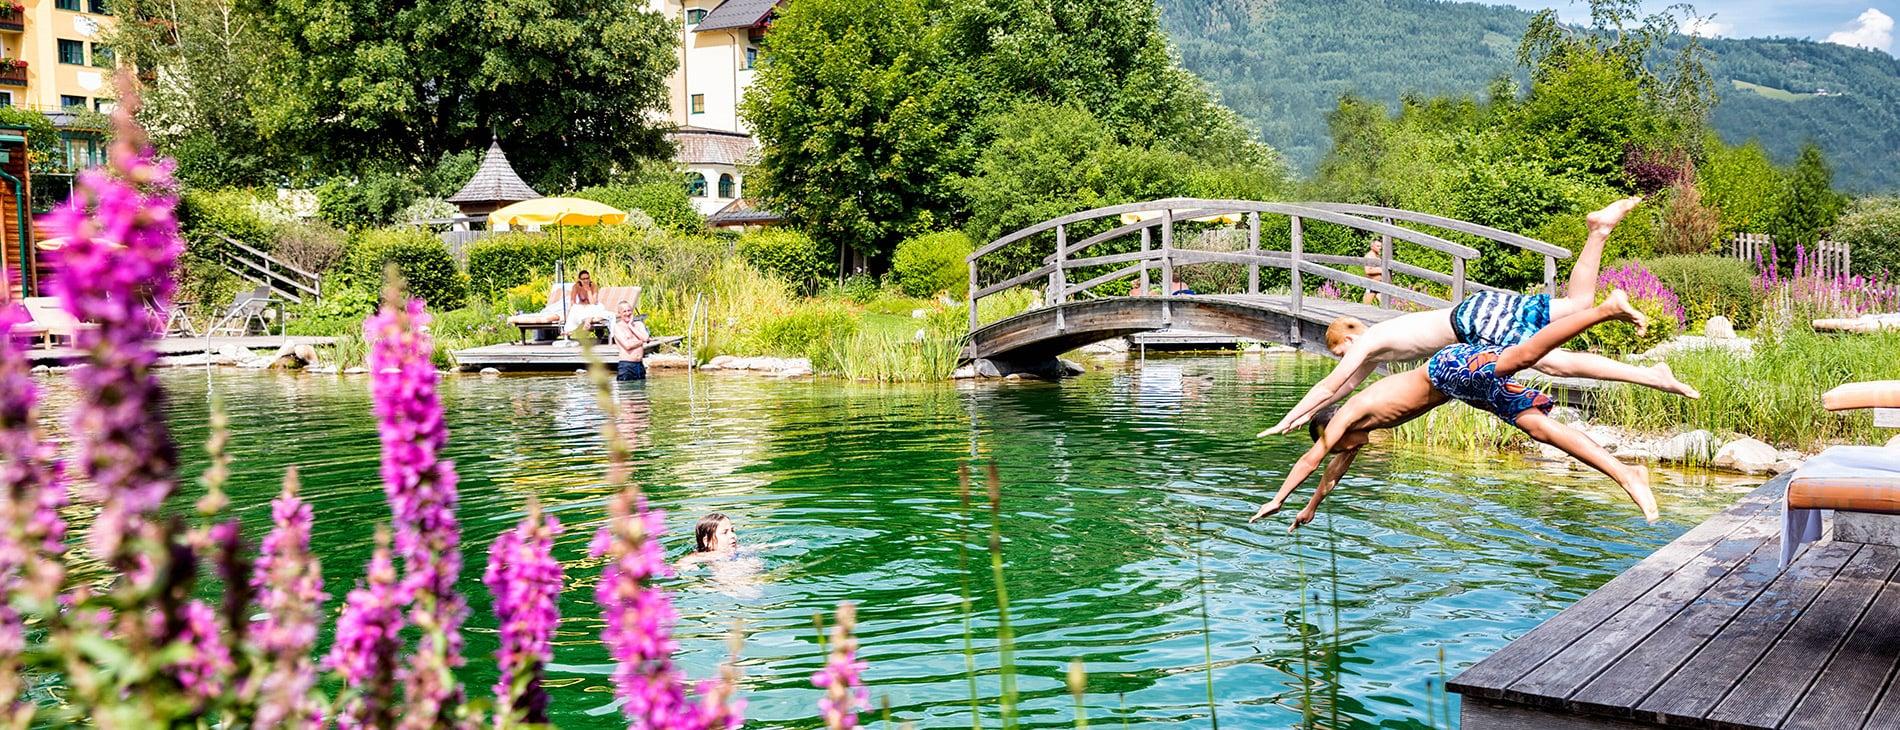 Cool down – Wellness sommerfrisch